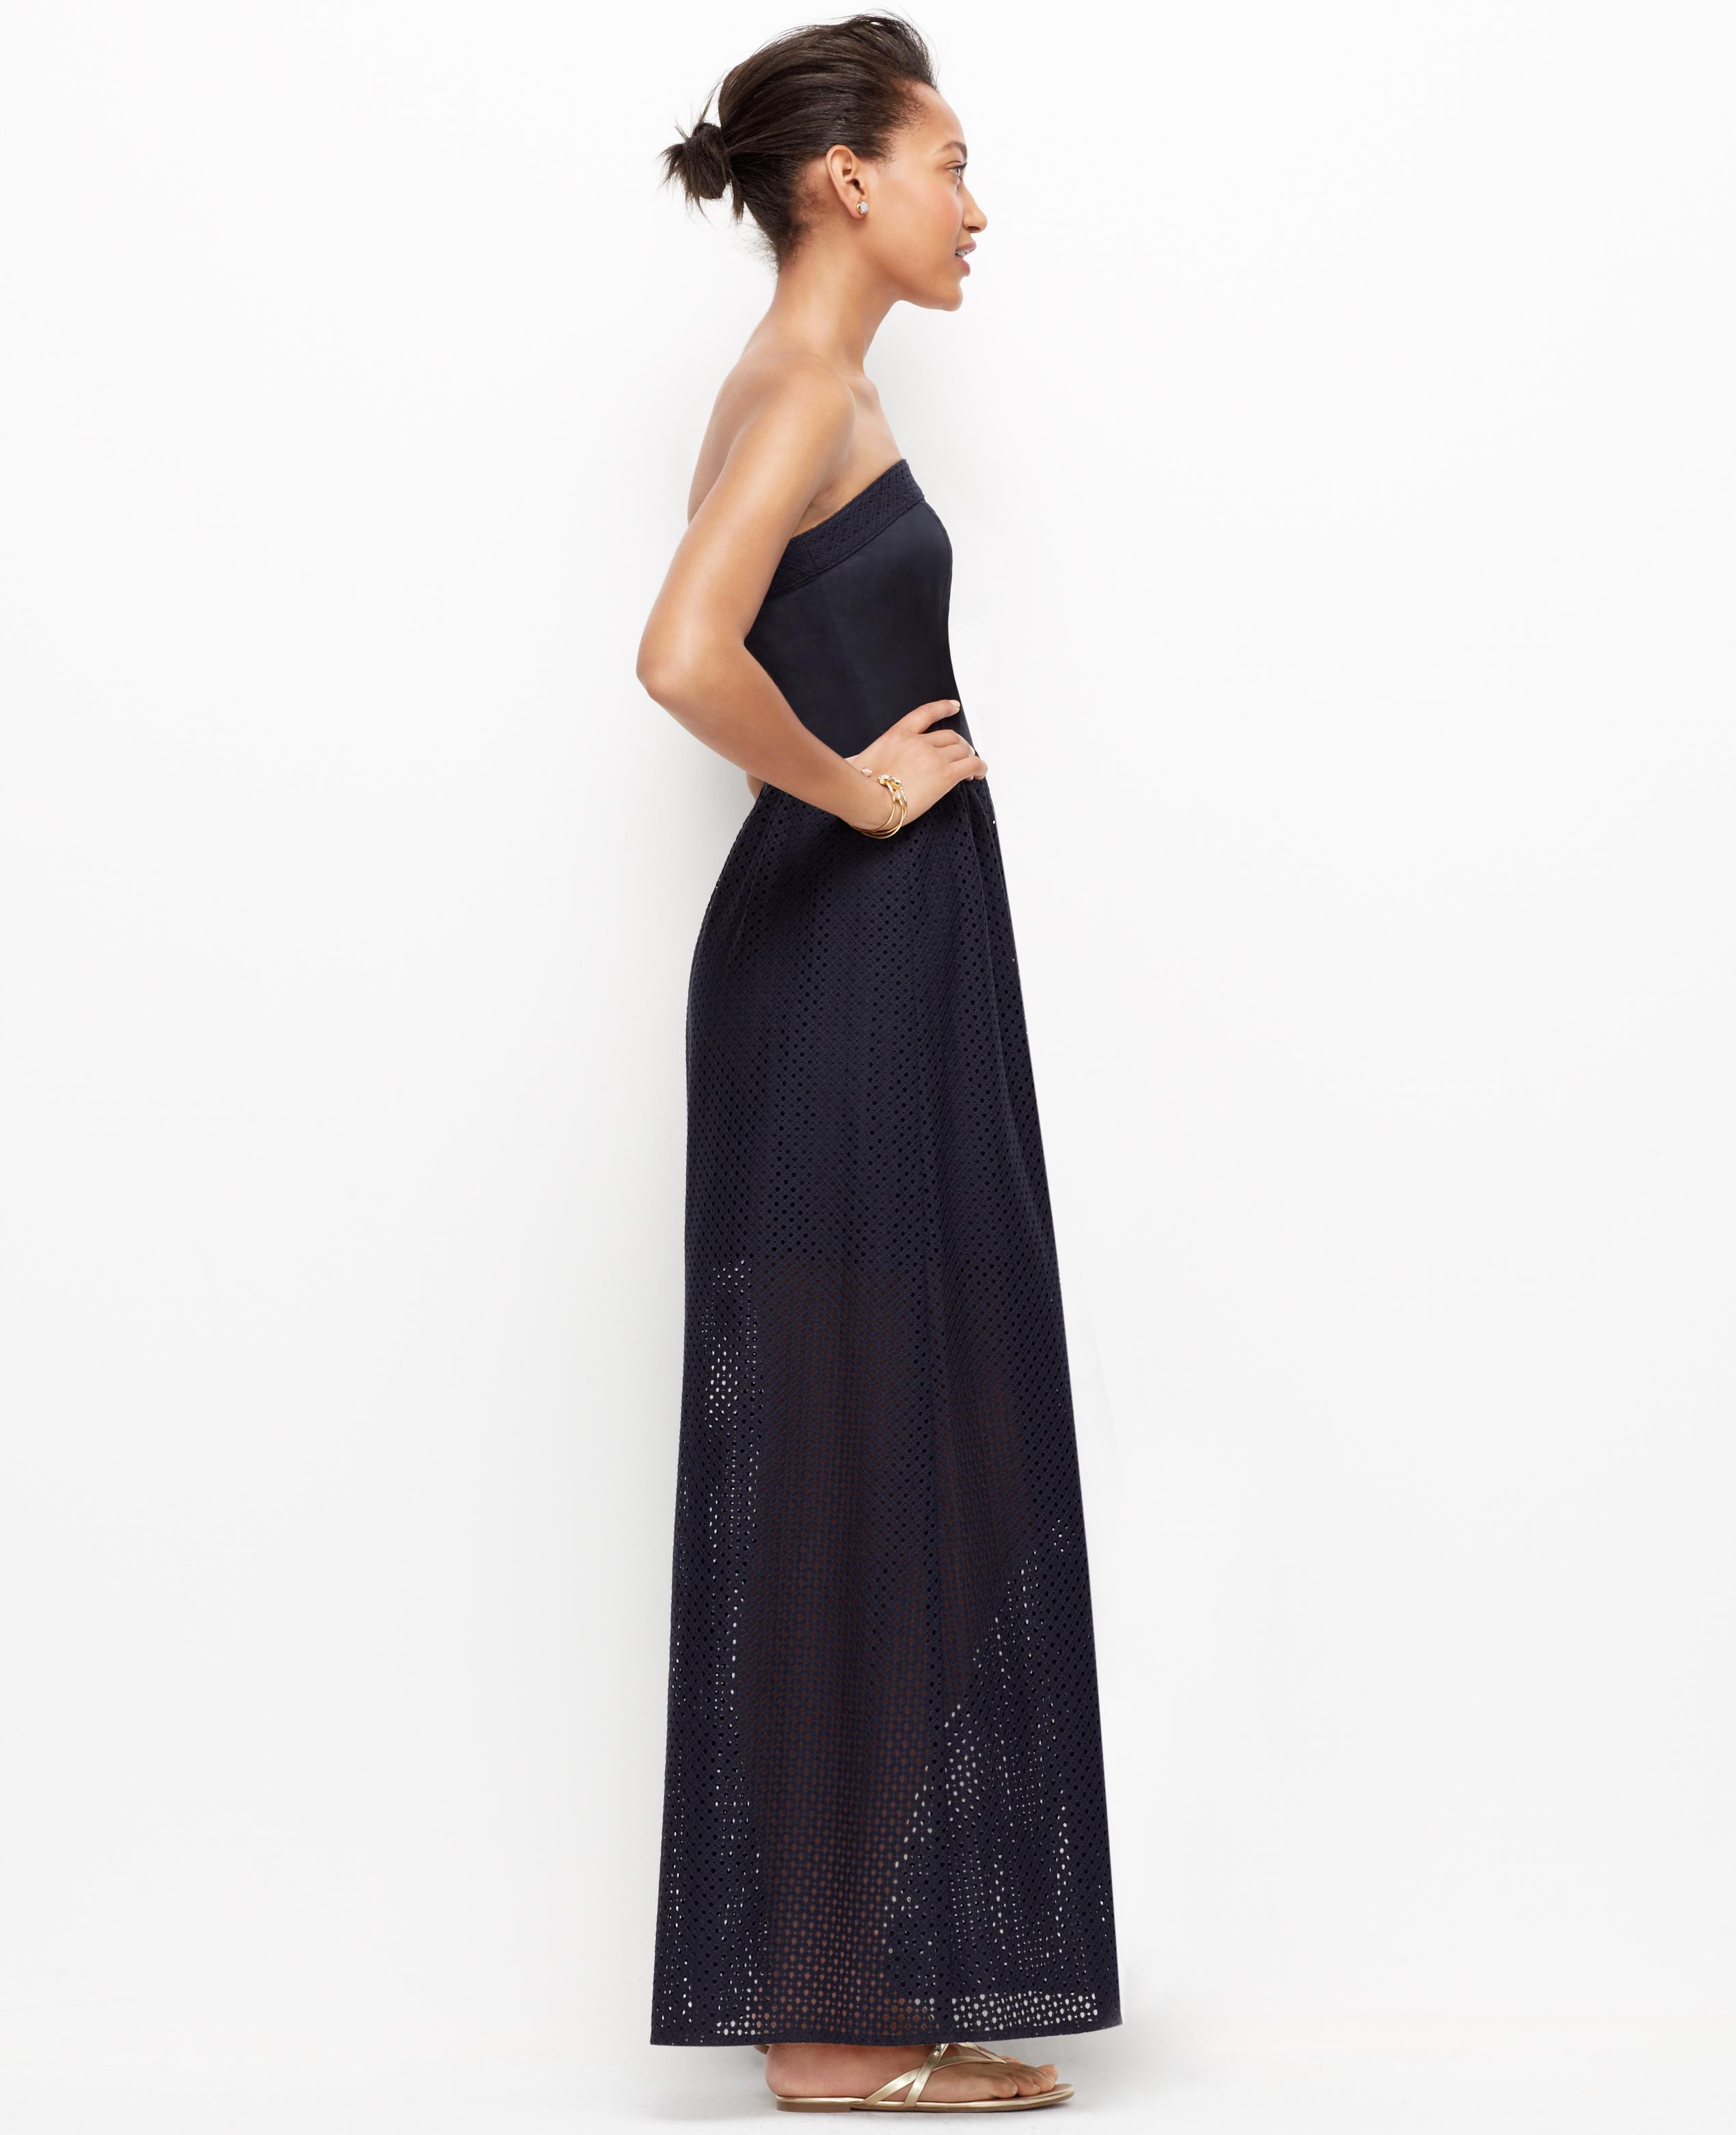 Petite strapless maxi dress